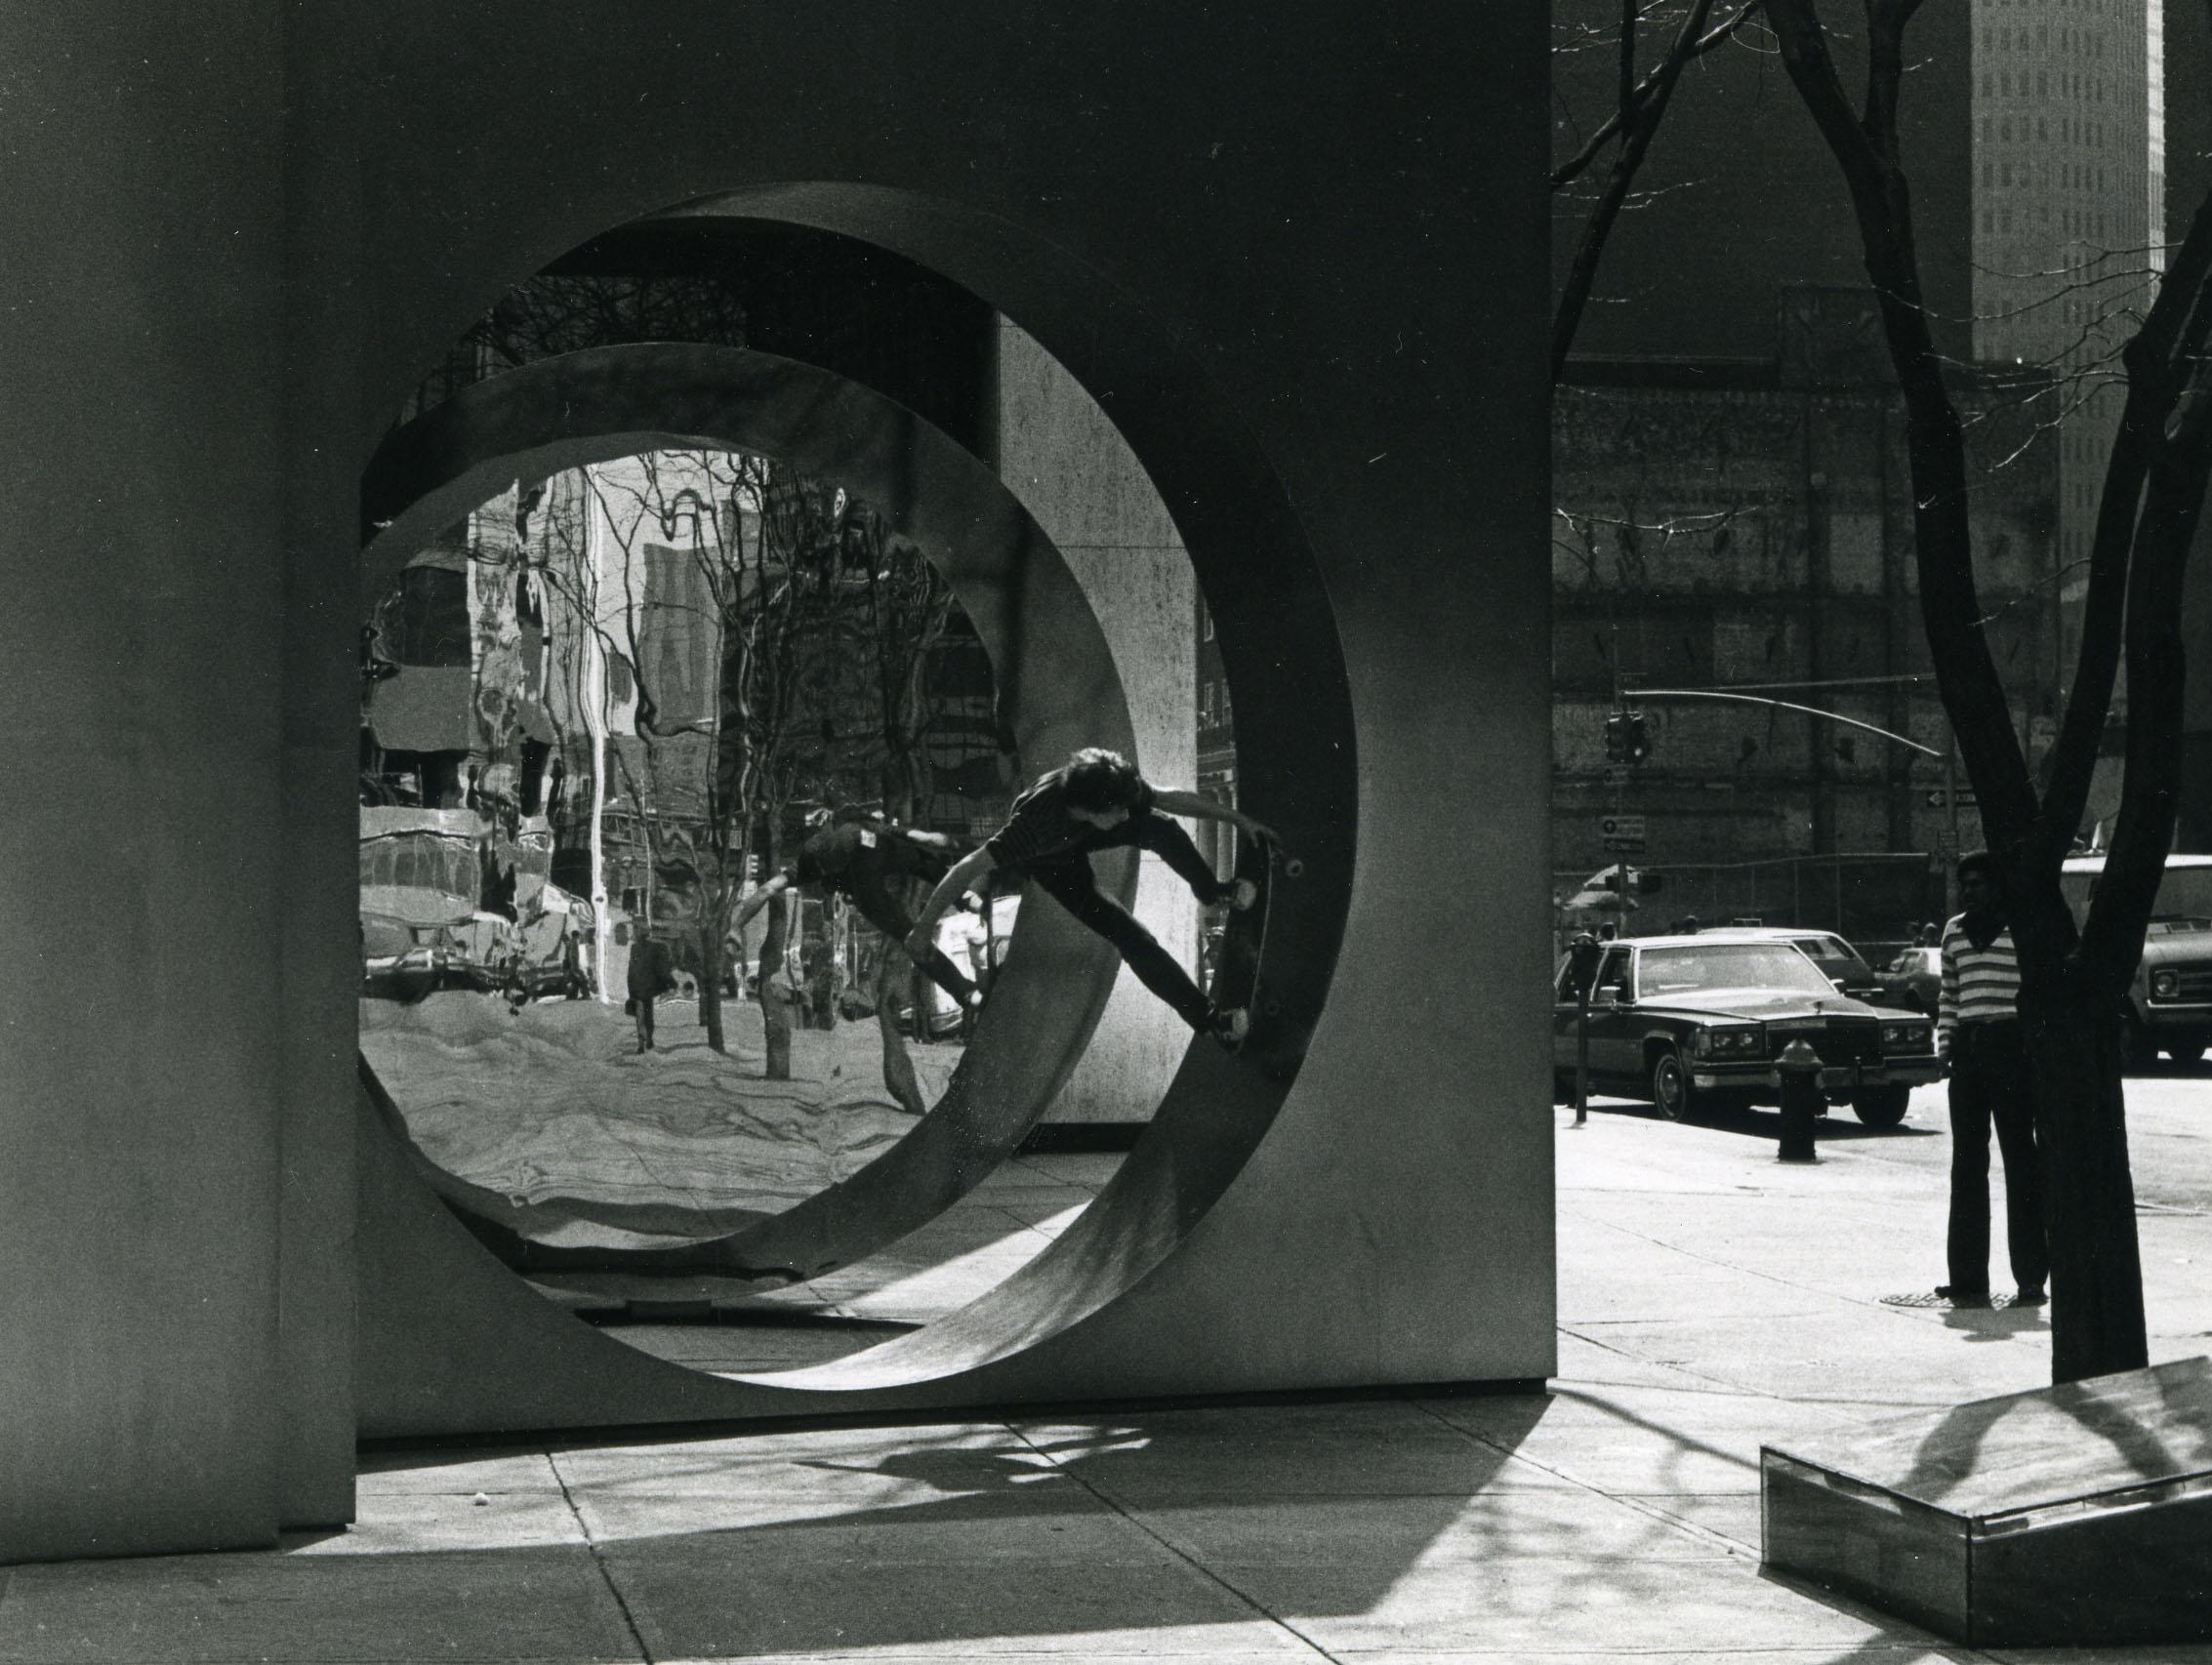 Landskating. New York - Photo Jessica Bard, circa 1980